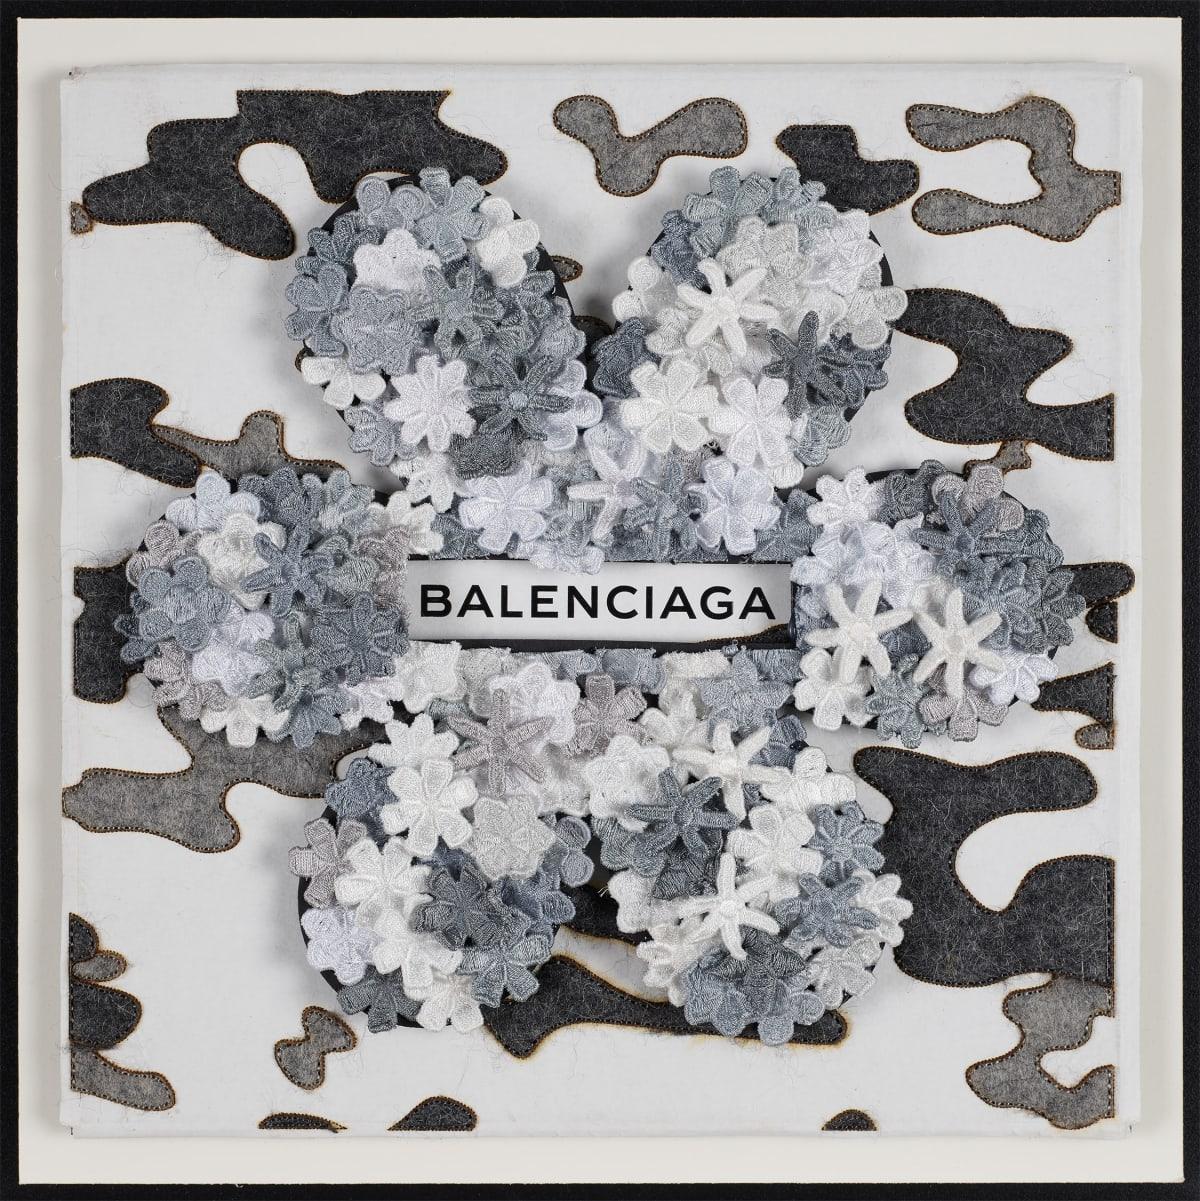 Stephen Wilson, Balenciaga Flower Flower, Silver , 2019